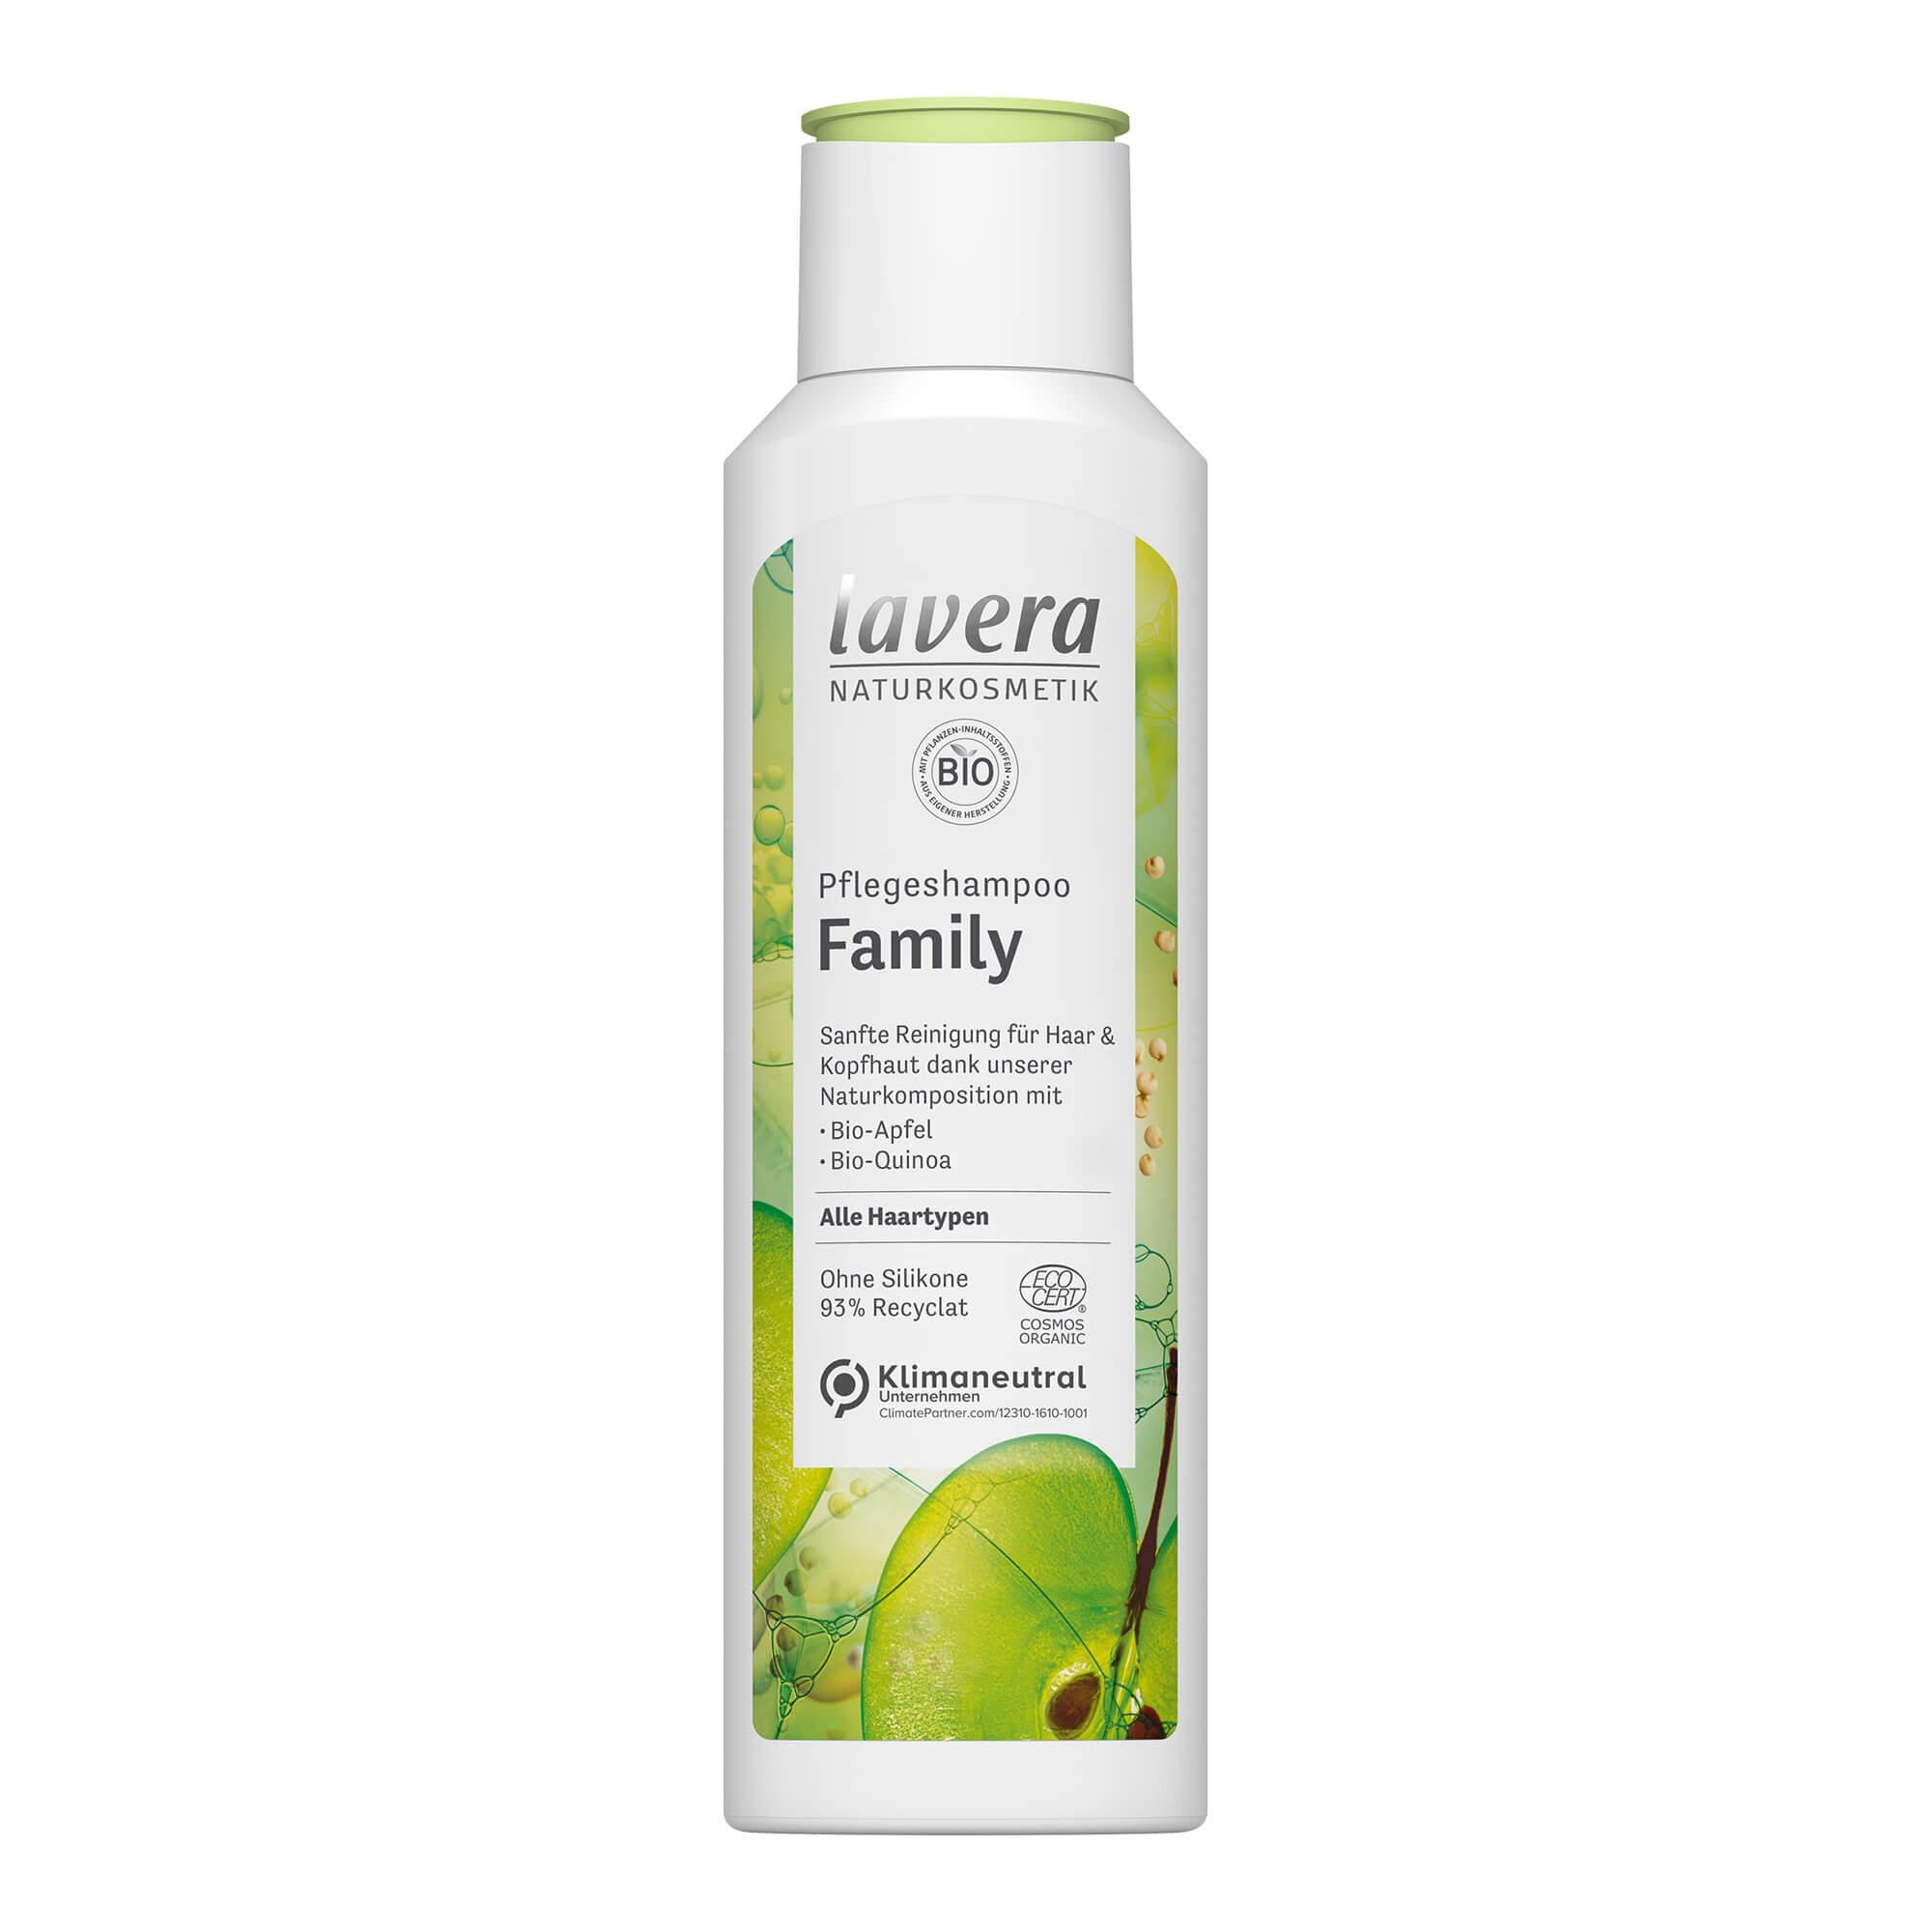 Lavera Pflegeshampoo Family